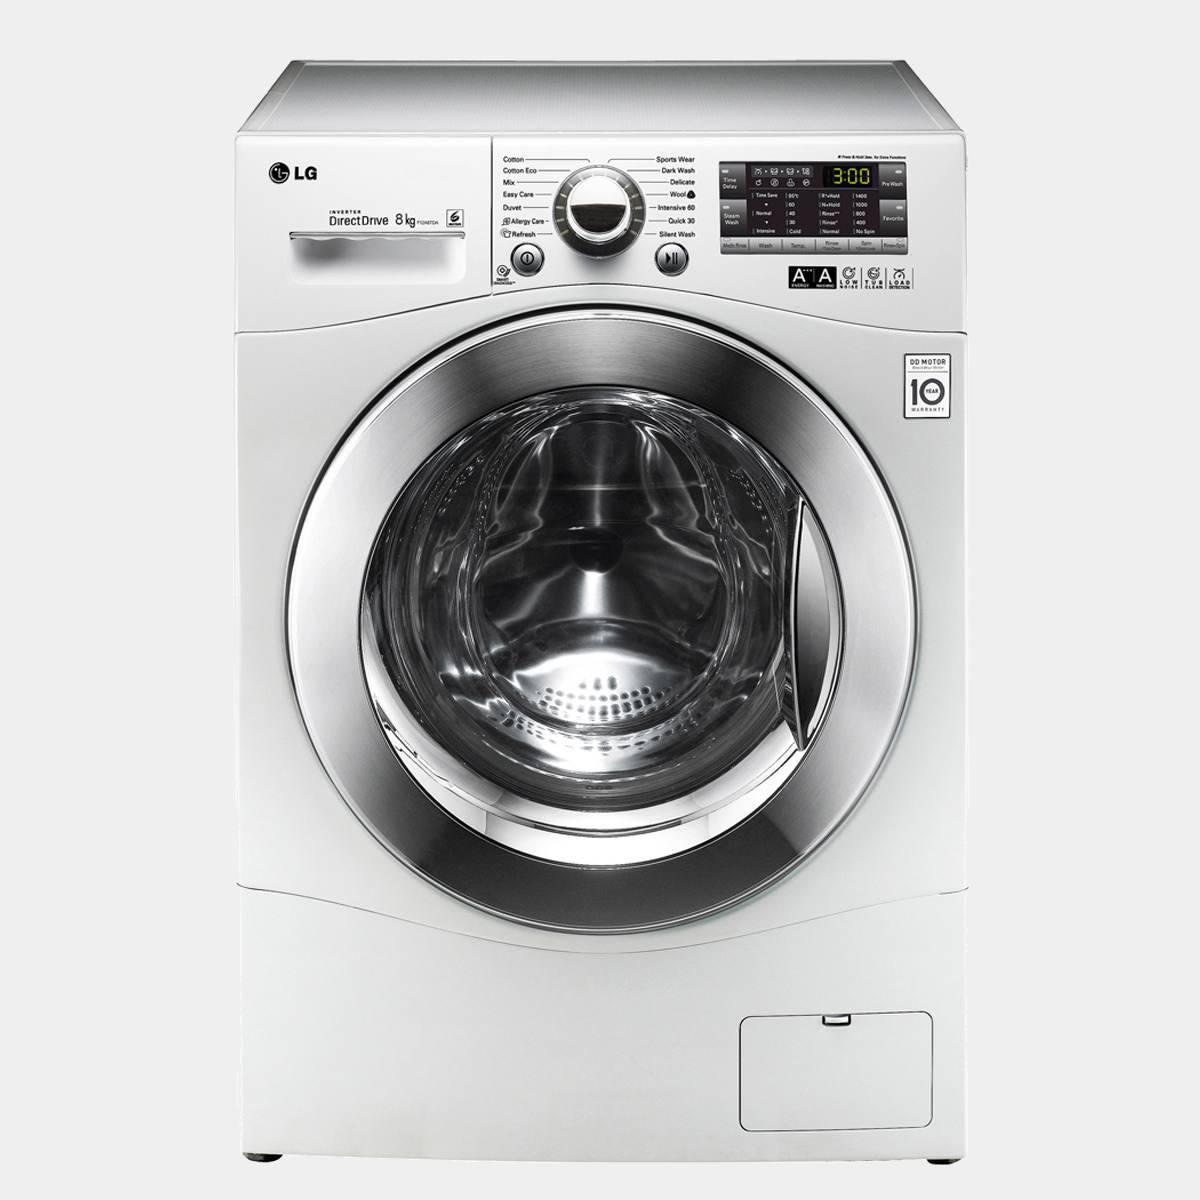 Lavadora lg f14a8tda1 8k 1400r a 20 6m - Opiniones lavadoras lg ...